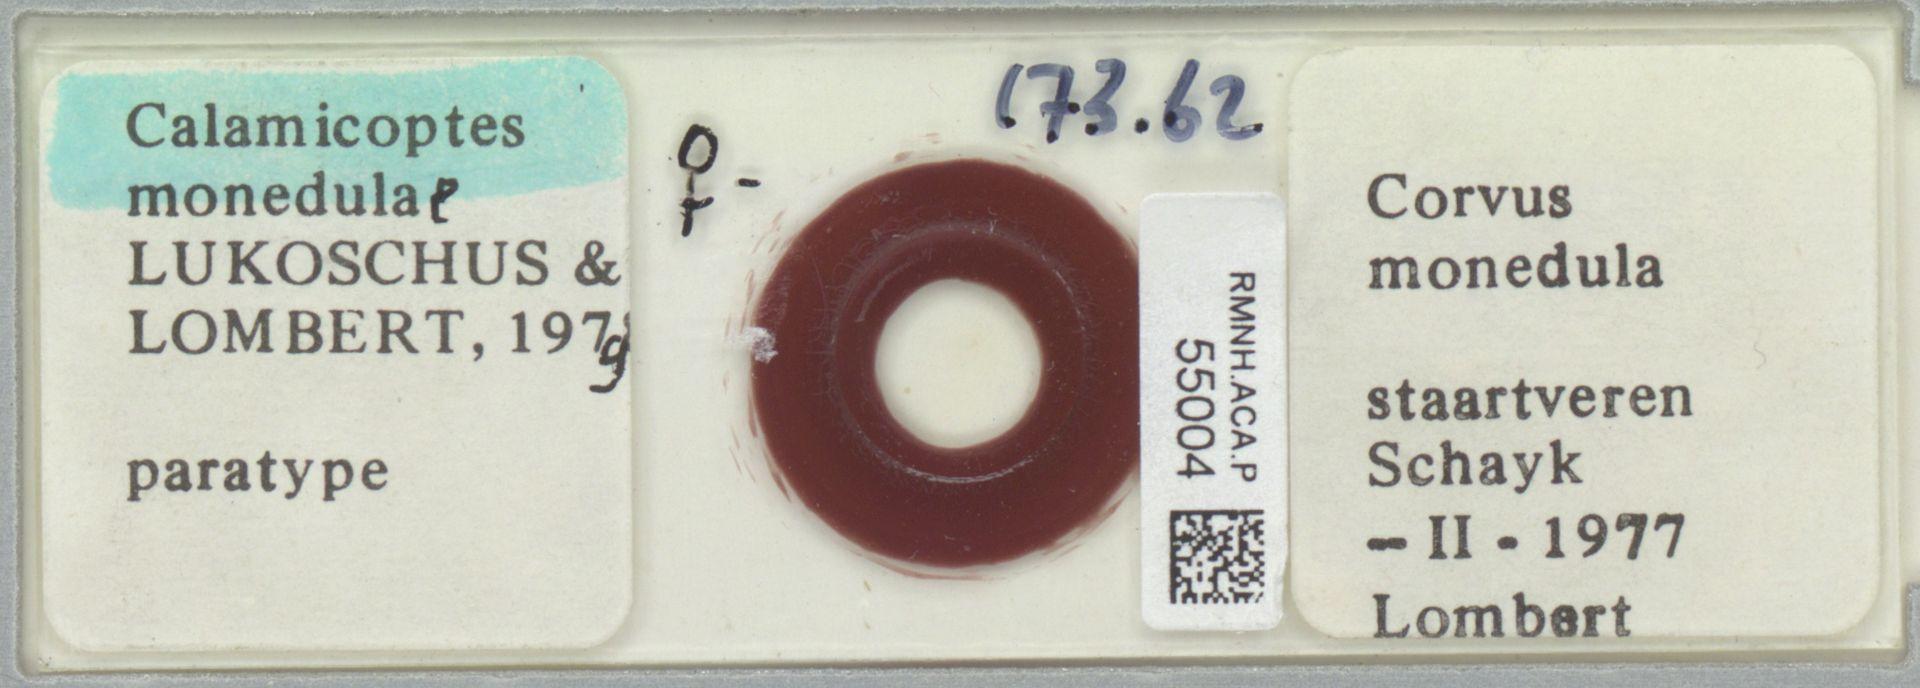 RMNH.ACA.P.55004 | Calamicoptes monedulae Lukoschus & Lombert, 1979